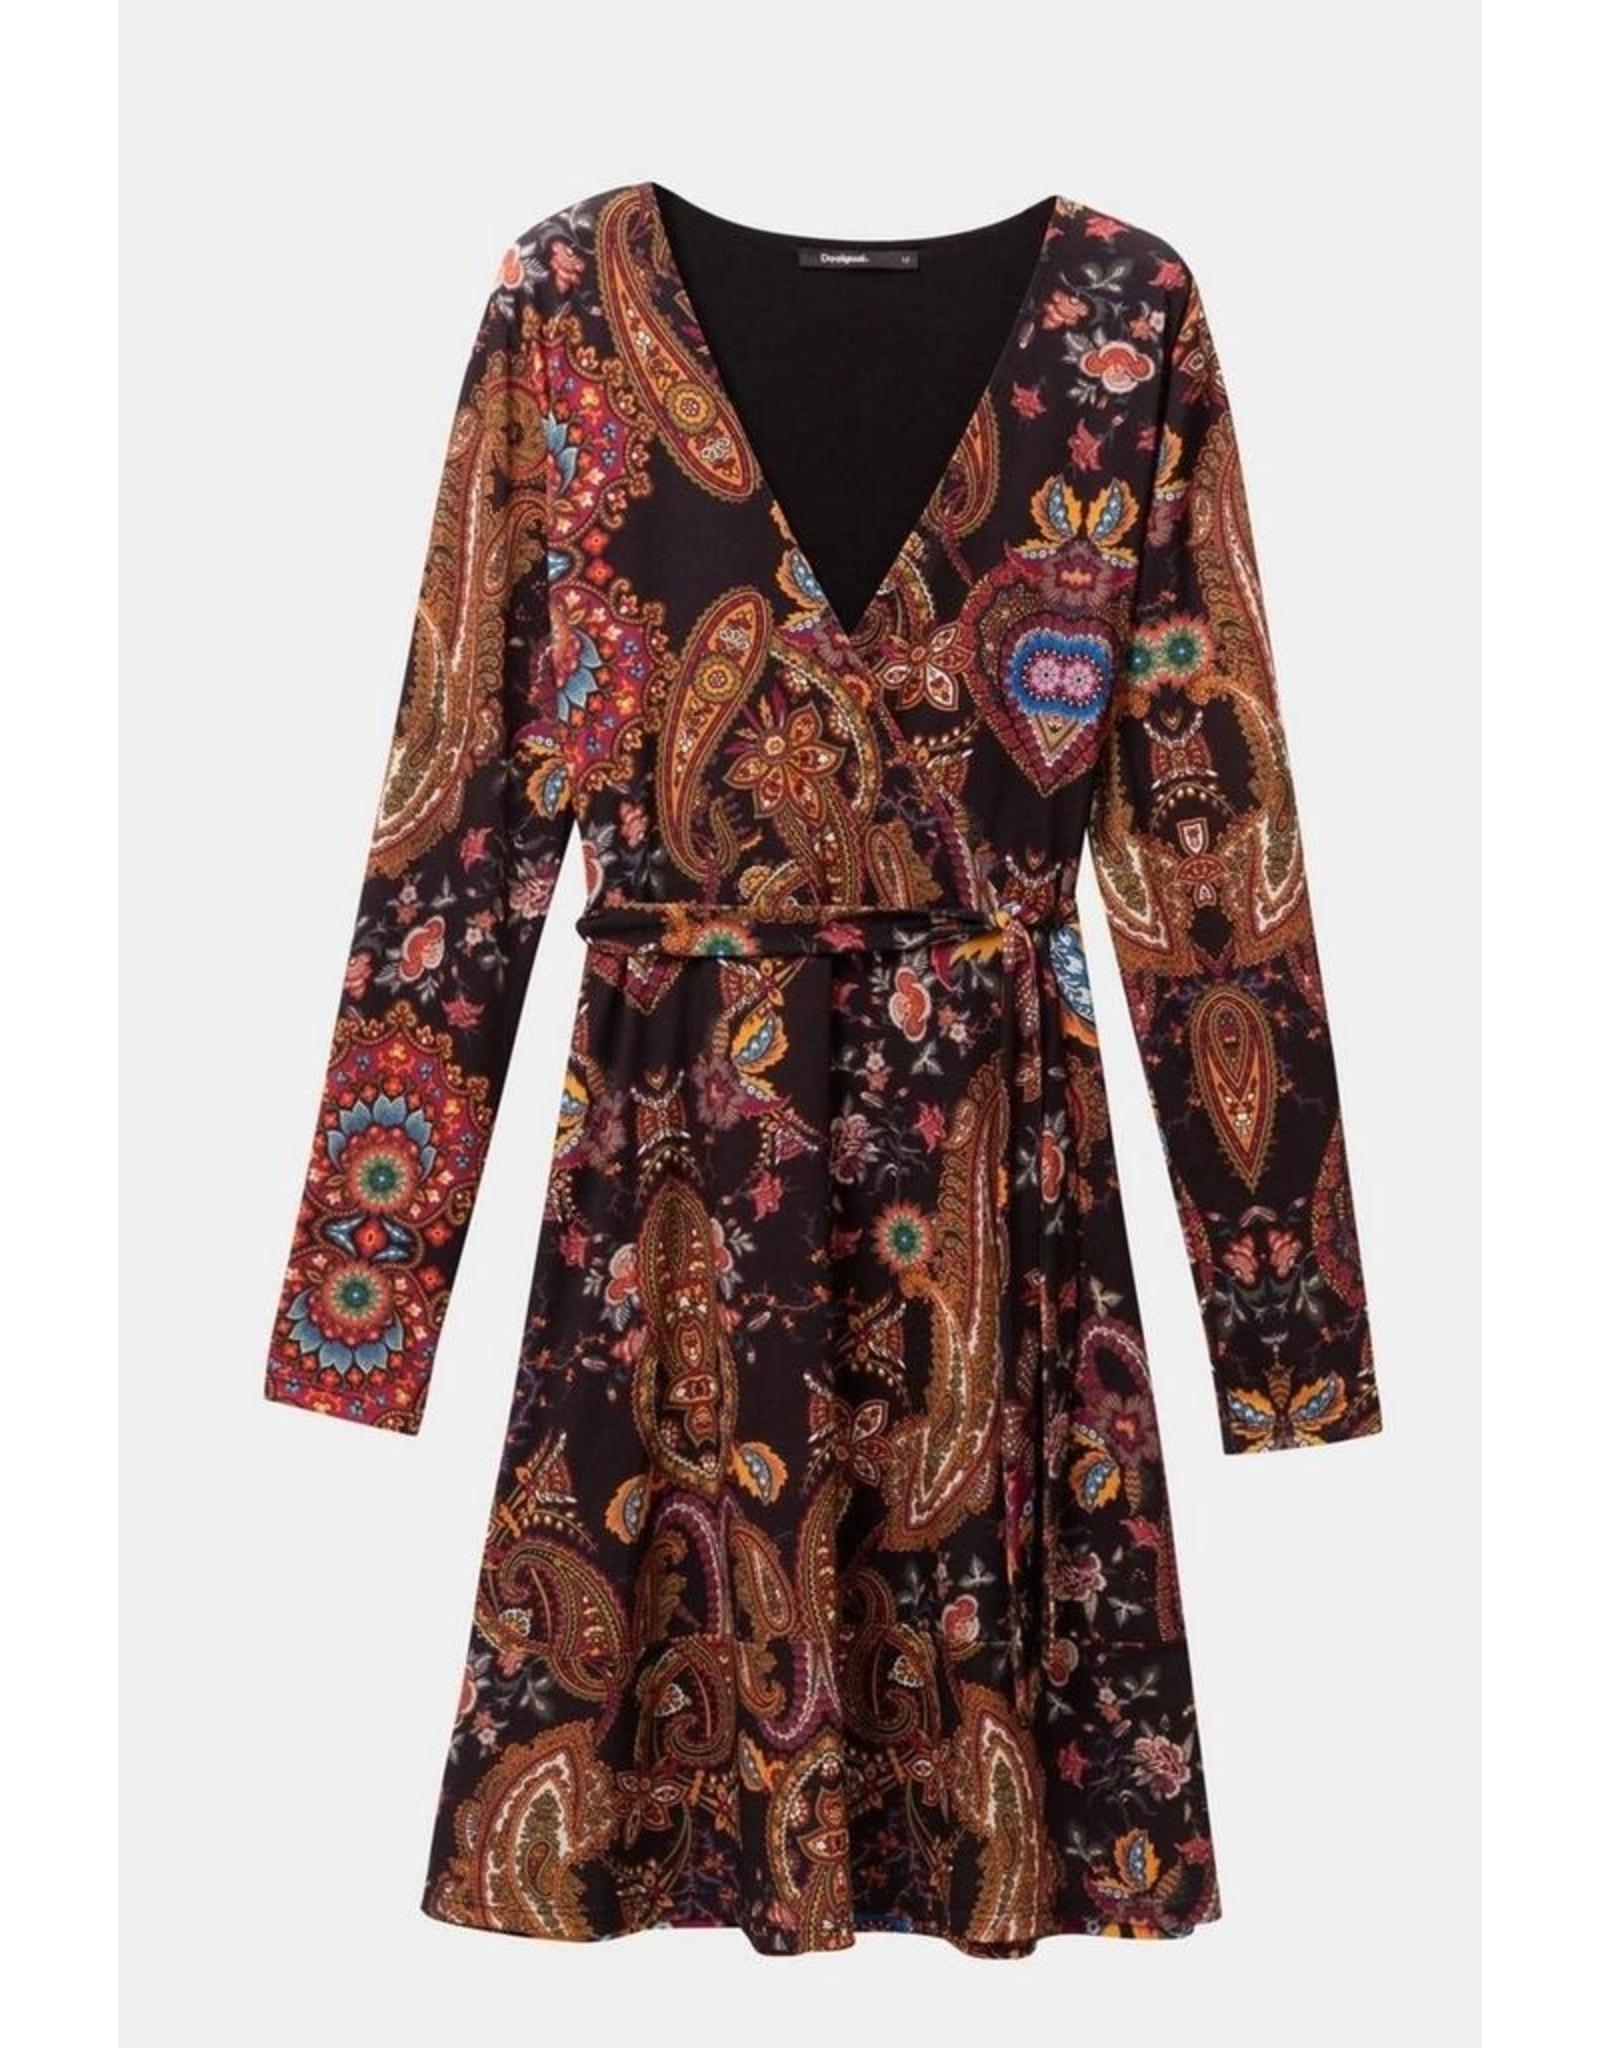 Desigual Boho Autumn Dress